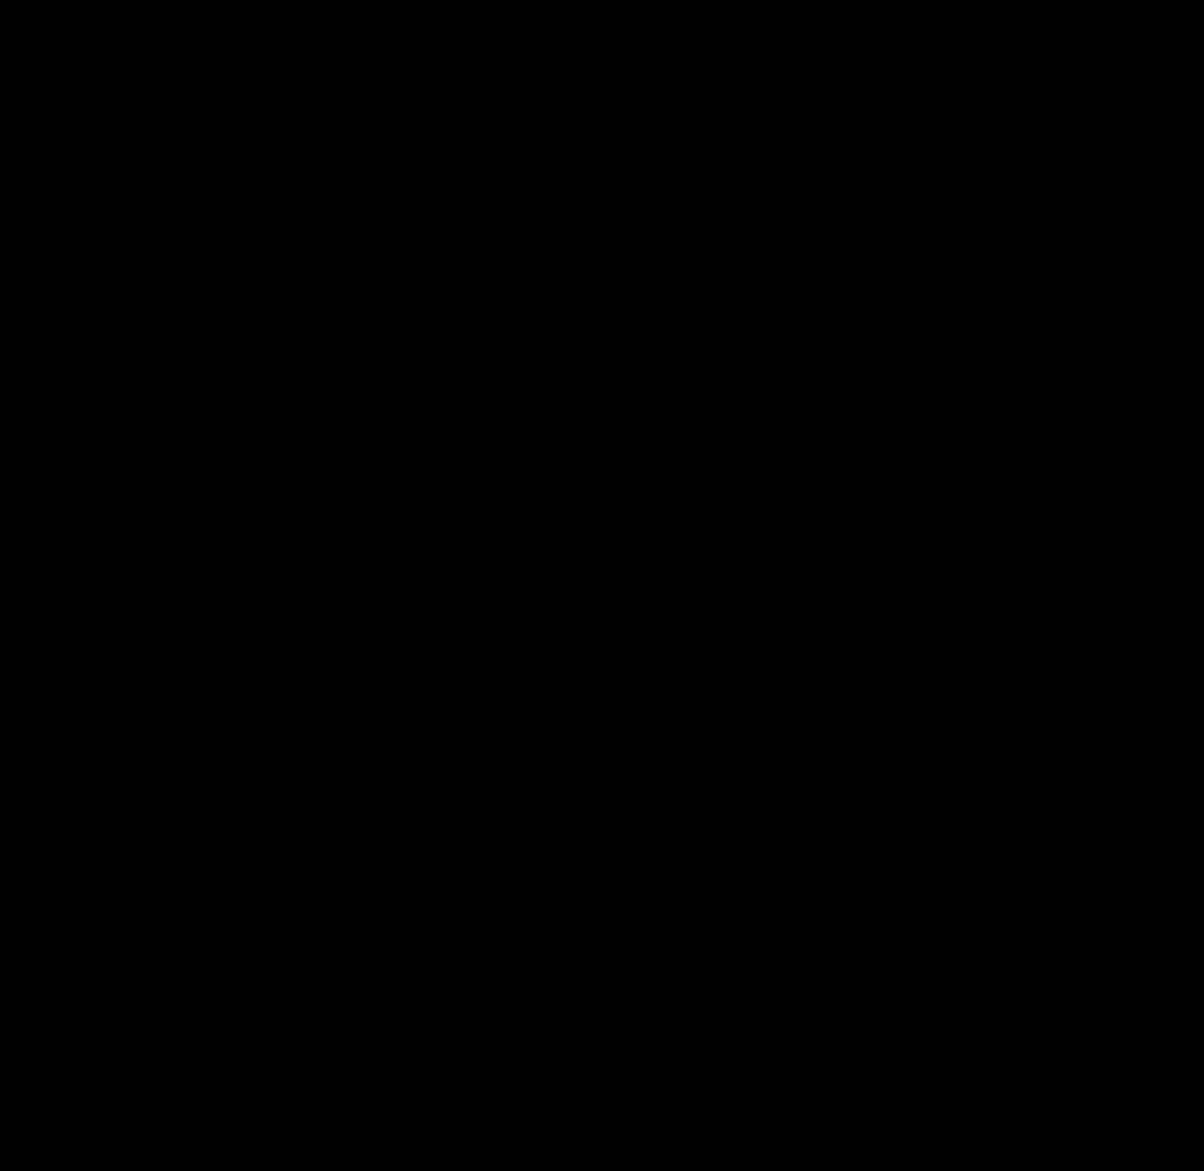 Double Angle Identities cos 2 theta